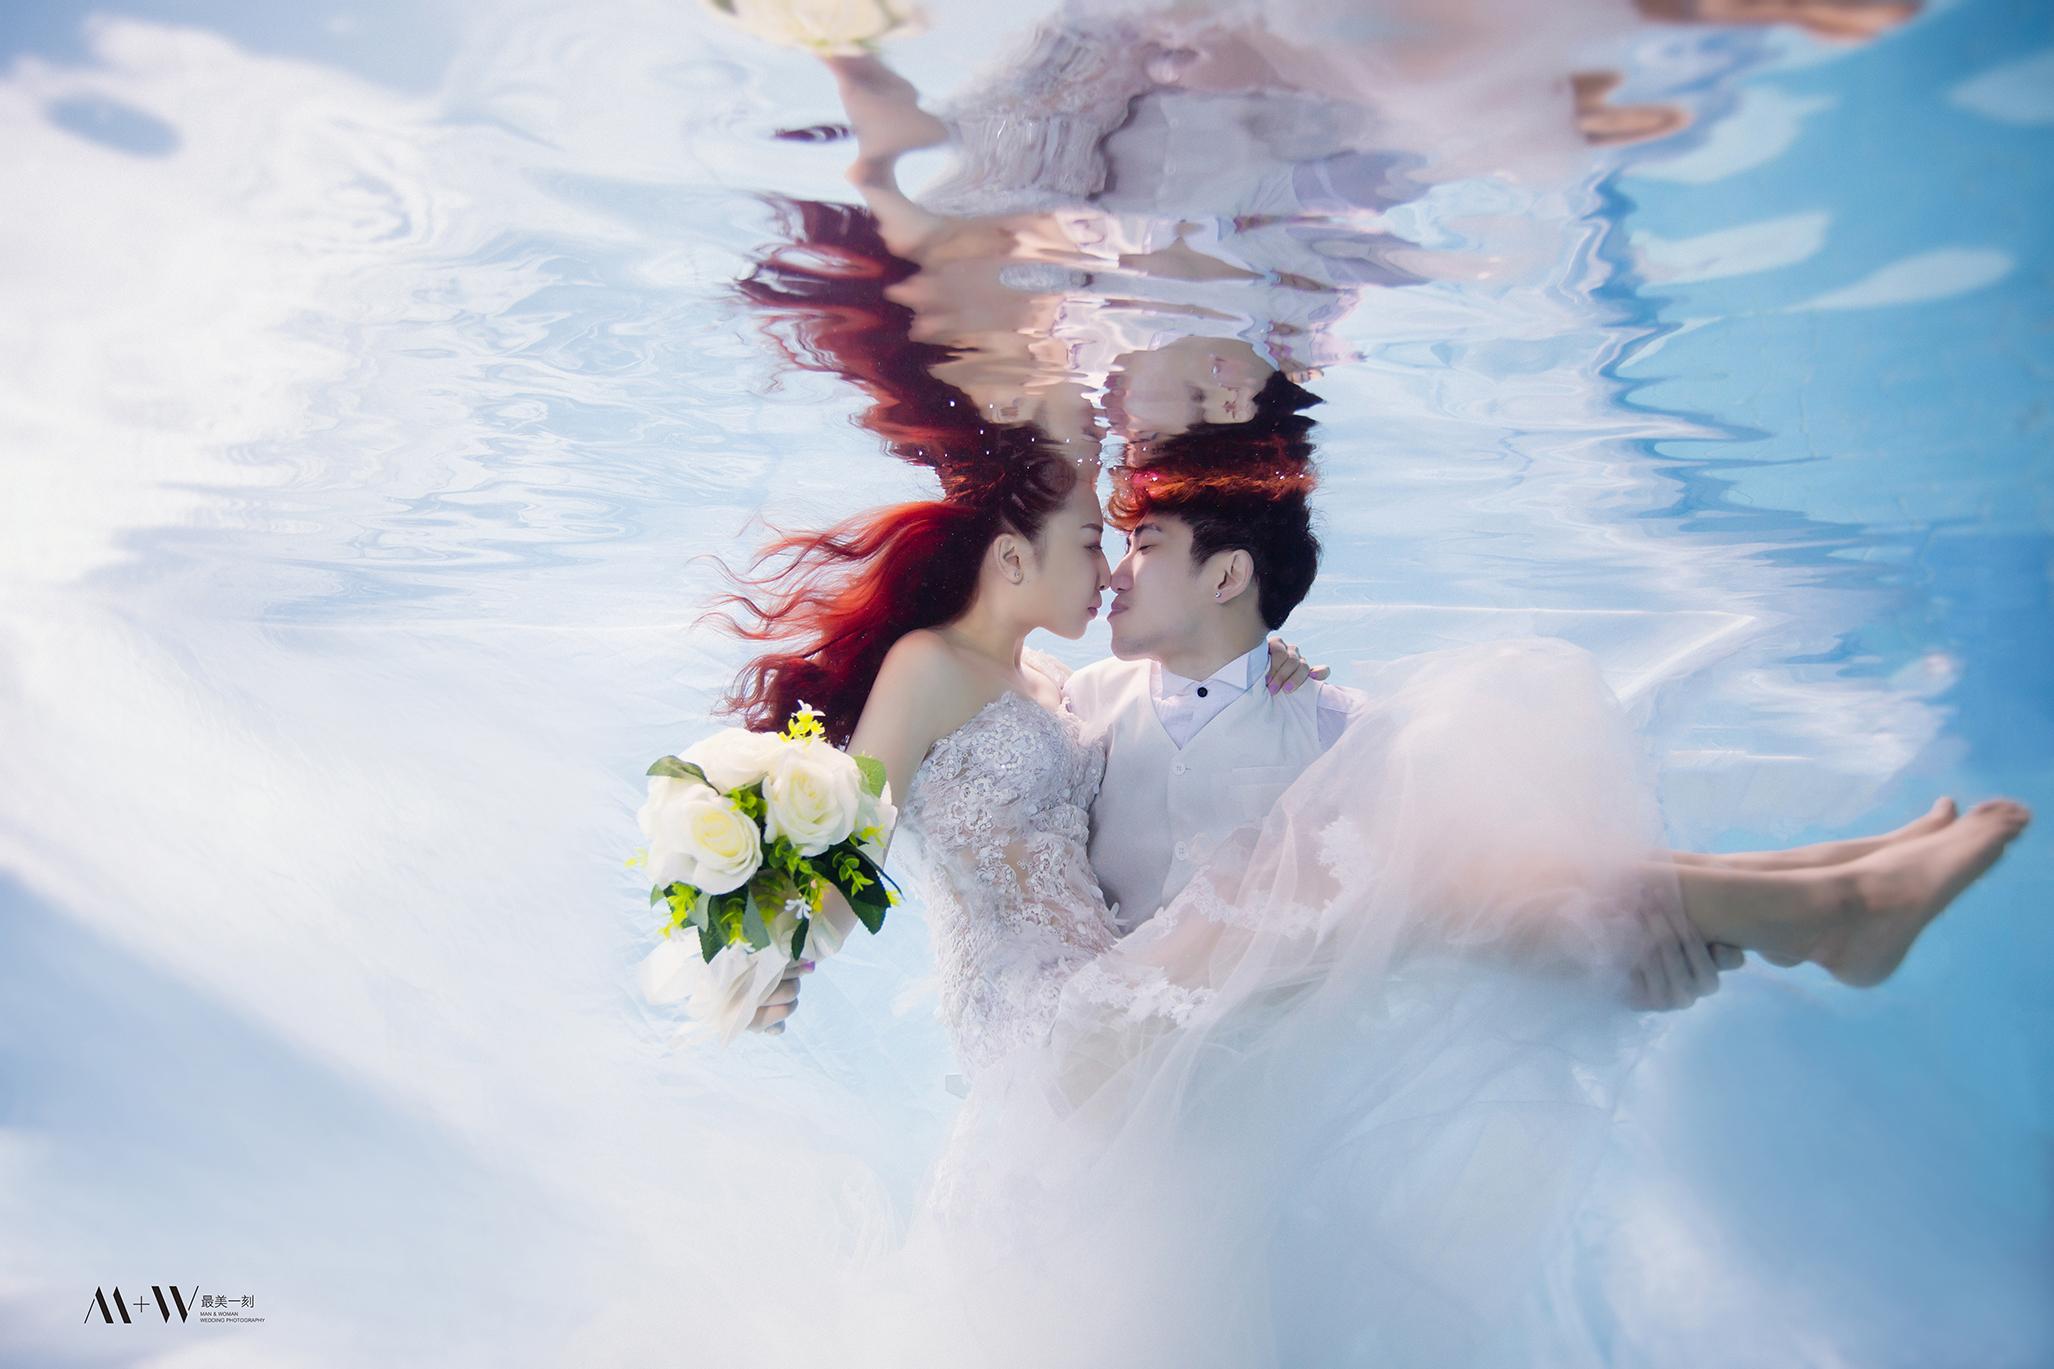 水中婚紗,水底攝影,underwater,underwaterphotography